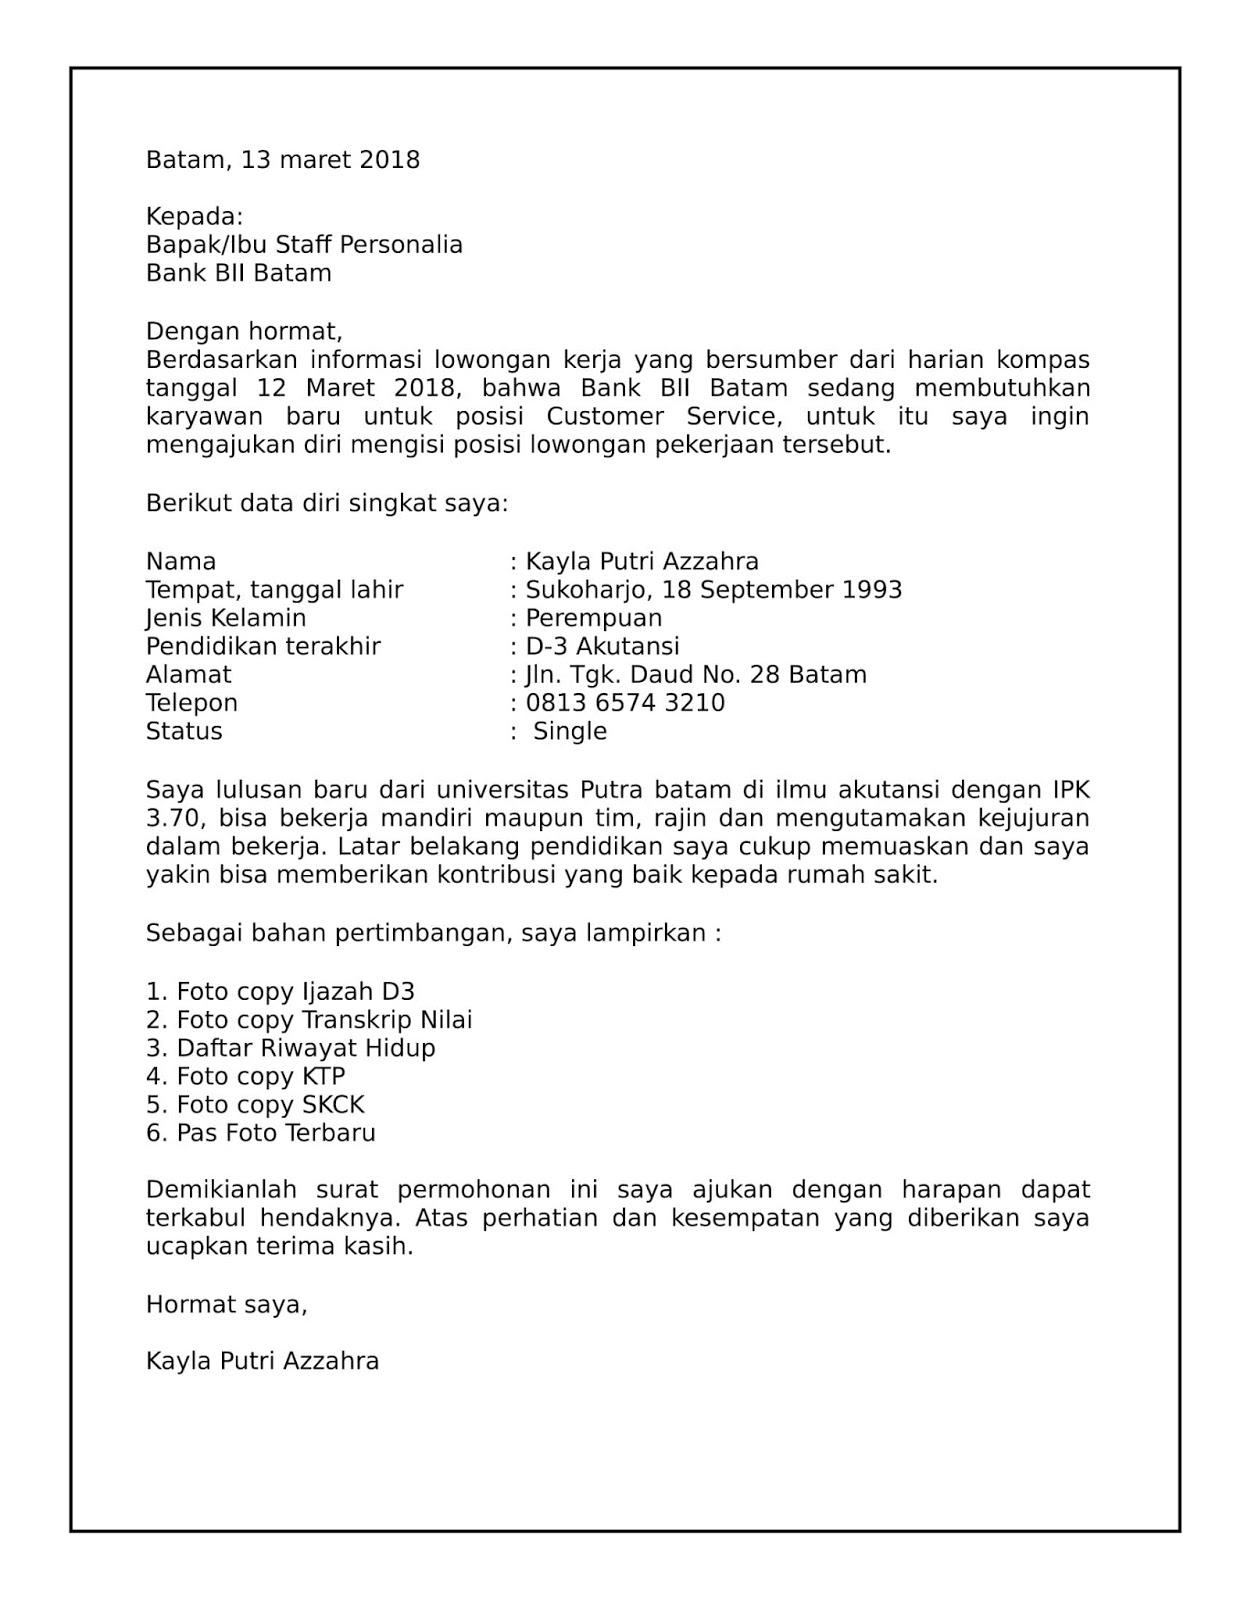 Contoh Surat Lamaran Kerja Di Bank Paling Bagus Contoh Surat